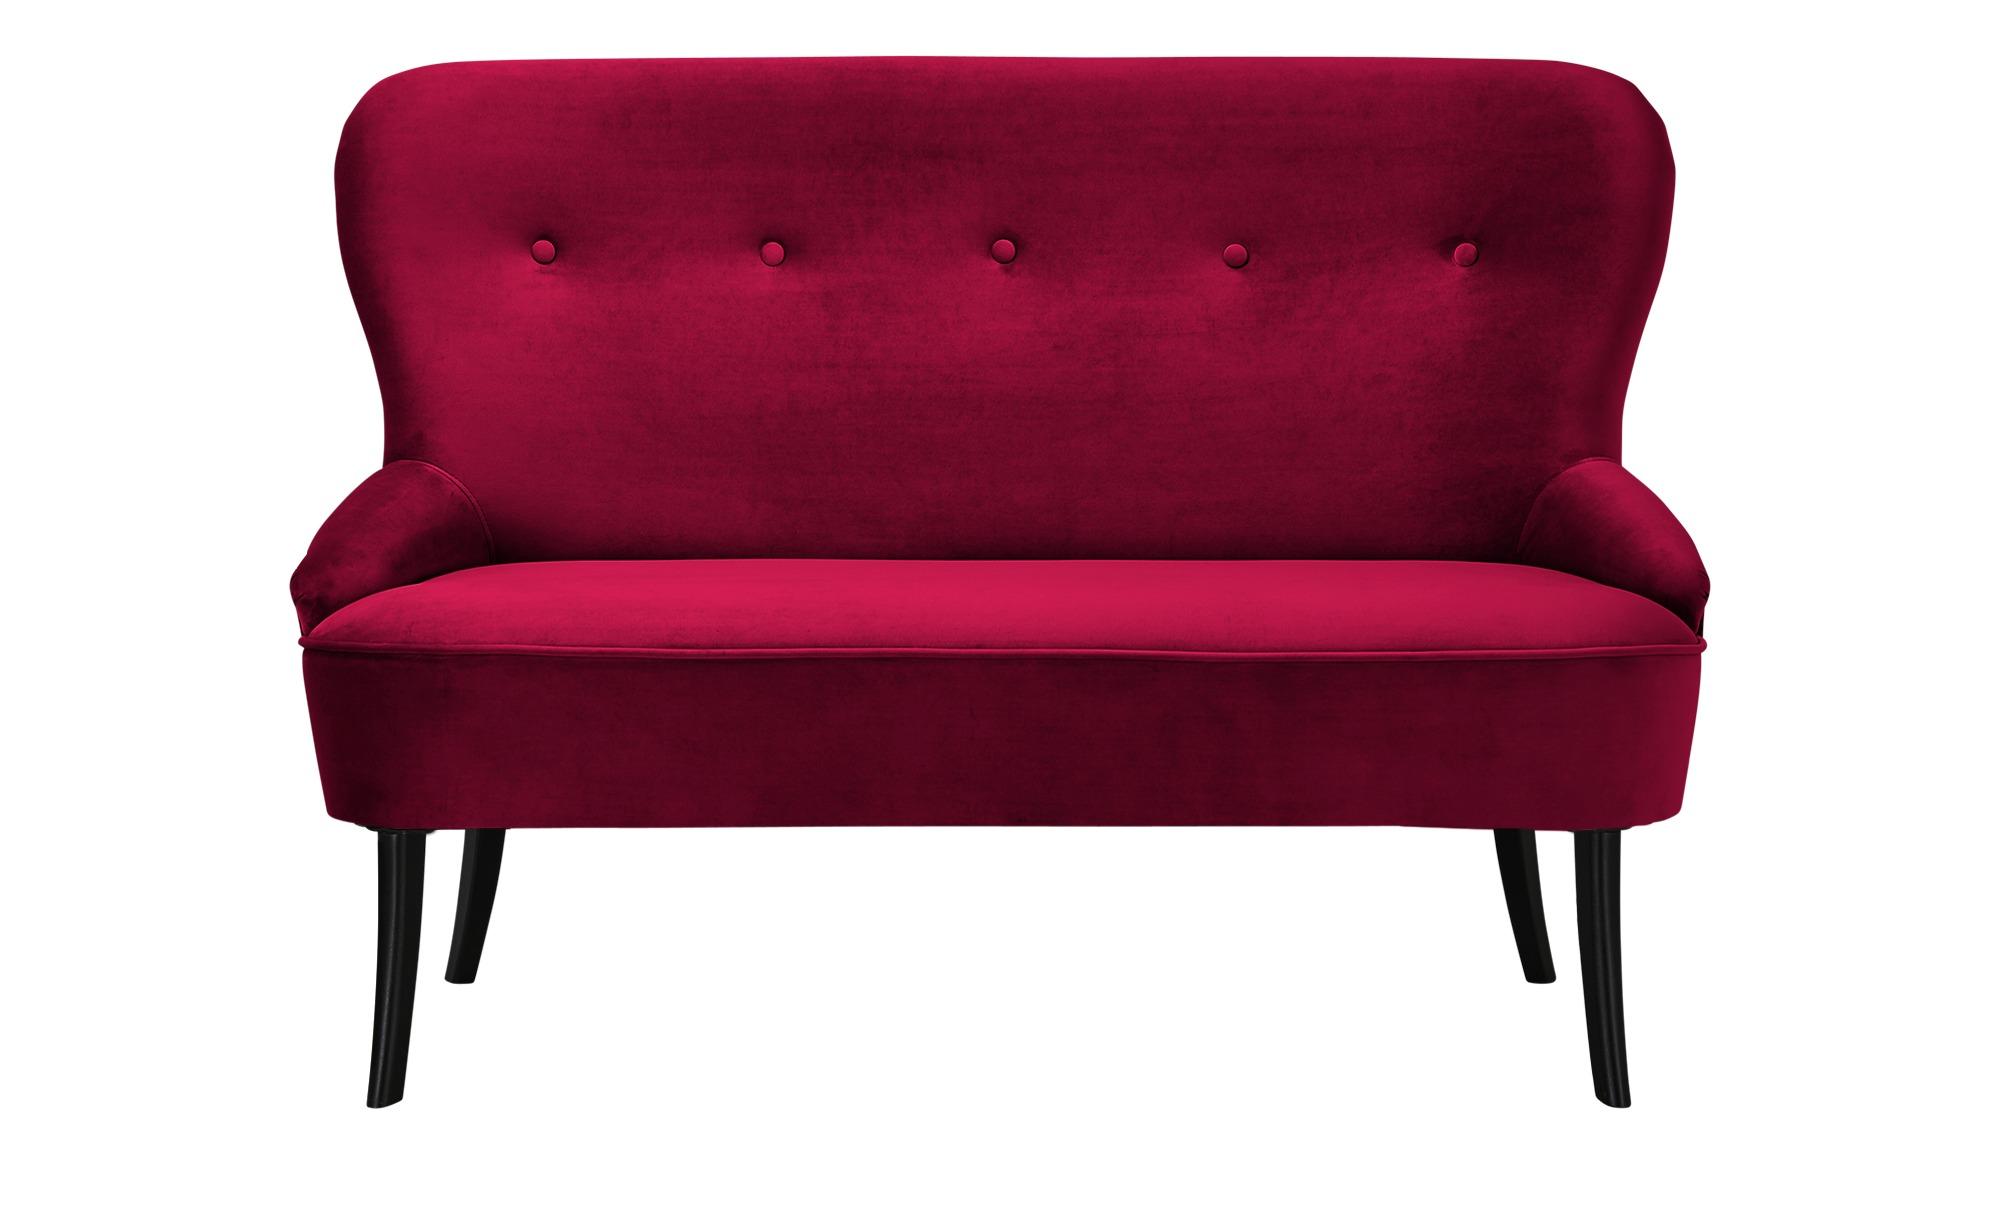 smart Sofa  Renia ¦ rot ¦ Maße (cm): B: 130 H: 89 T: 72 Polstermöbel > Sofas > 2-Sitzer - Höffner